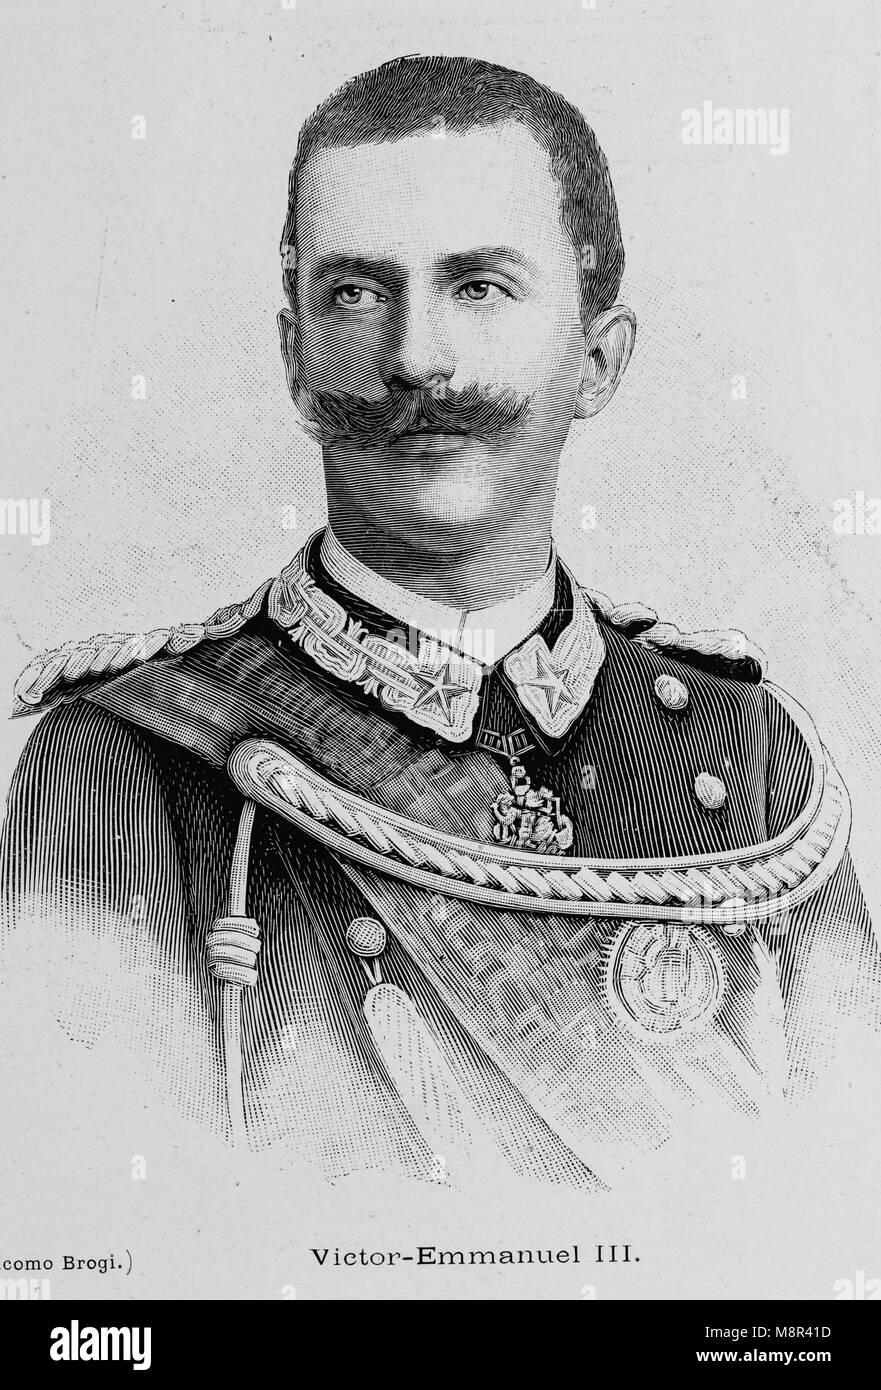 El rey Victor Emmanuel III de Italia, imagen del semanario francés l'Illustration, 4º de agosto de Imagen De Stock